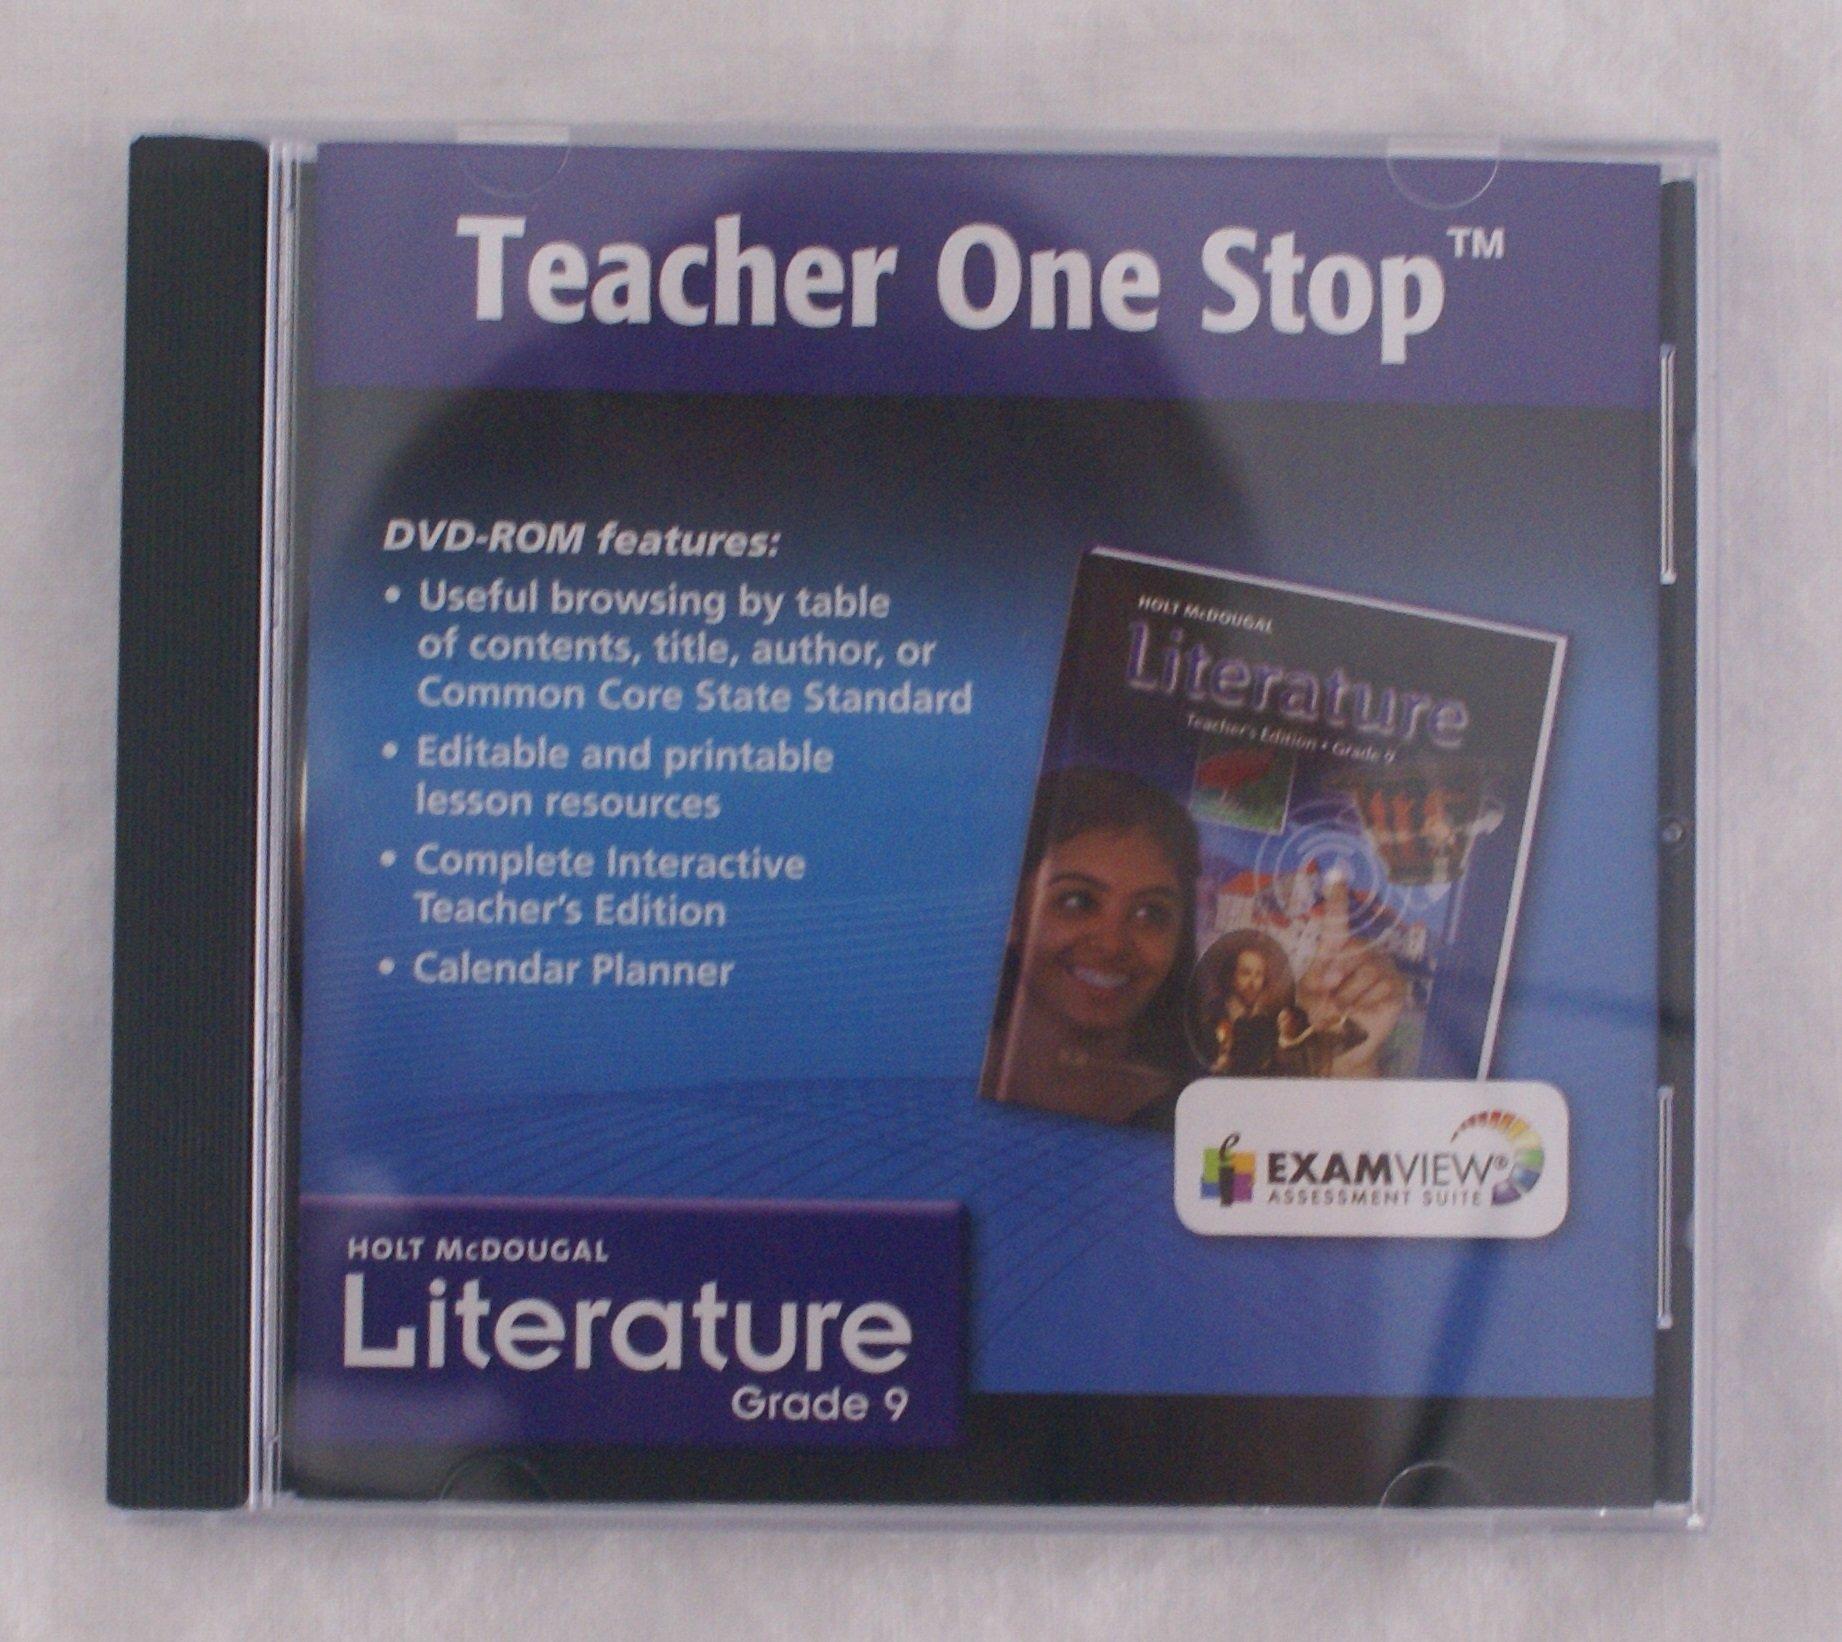 Teacher One Stop, Hold McDougal Literature, Grade 9, Examview Assessment Suite DVD-ROM by Holt McDougal